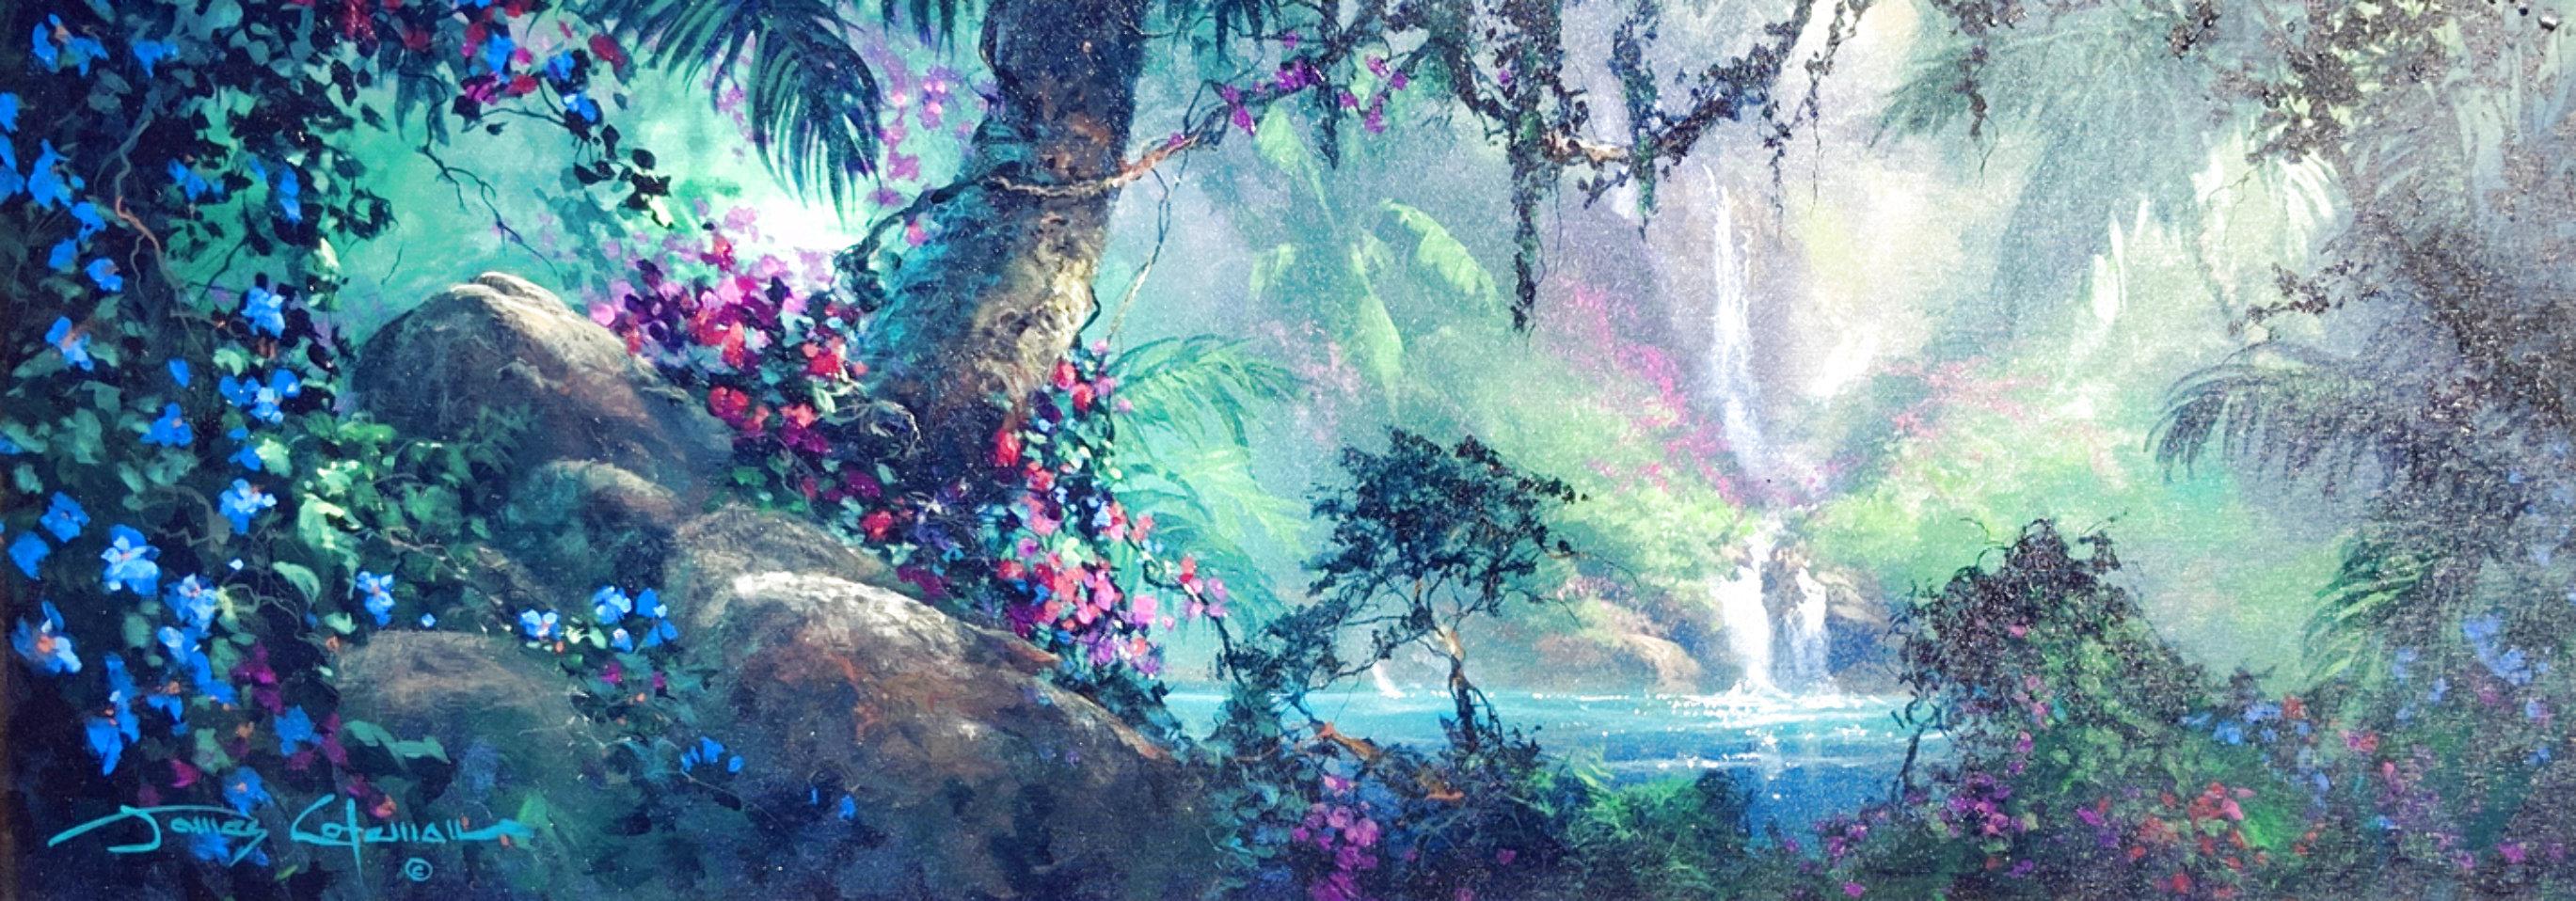 Along a Mystical Path 2000 20x48 Huge Original Painting by James Coleman